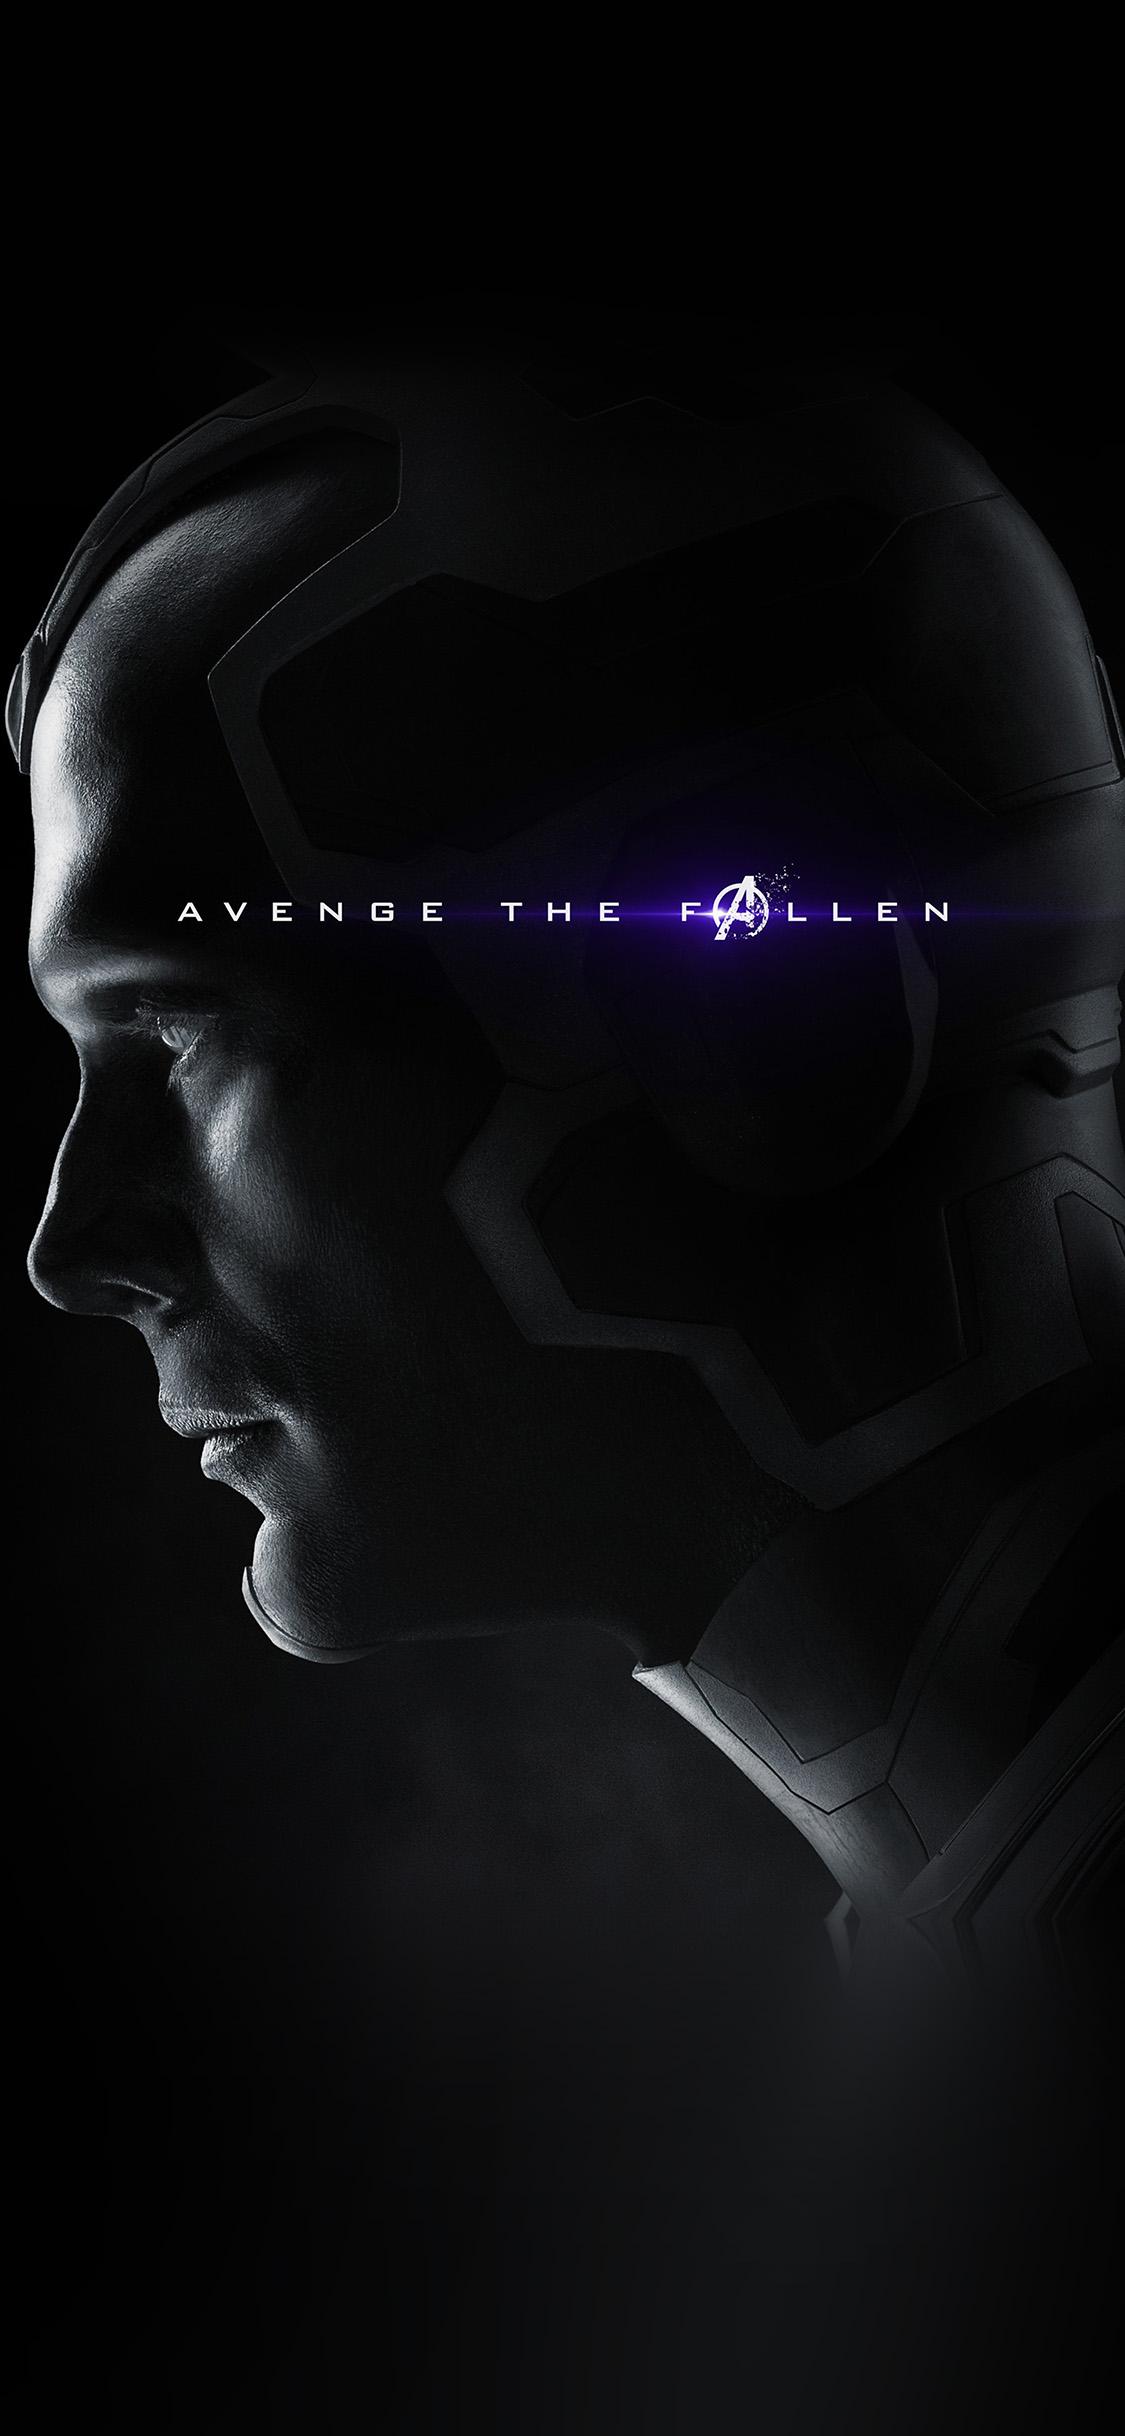 iPhonexpapers.com-Apple-iPhone-wallpaper-bi32-avengers-poster-endgame-hero-film-marvel-chractor-art-vision